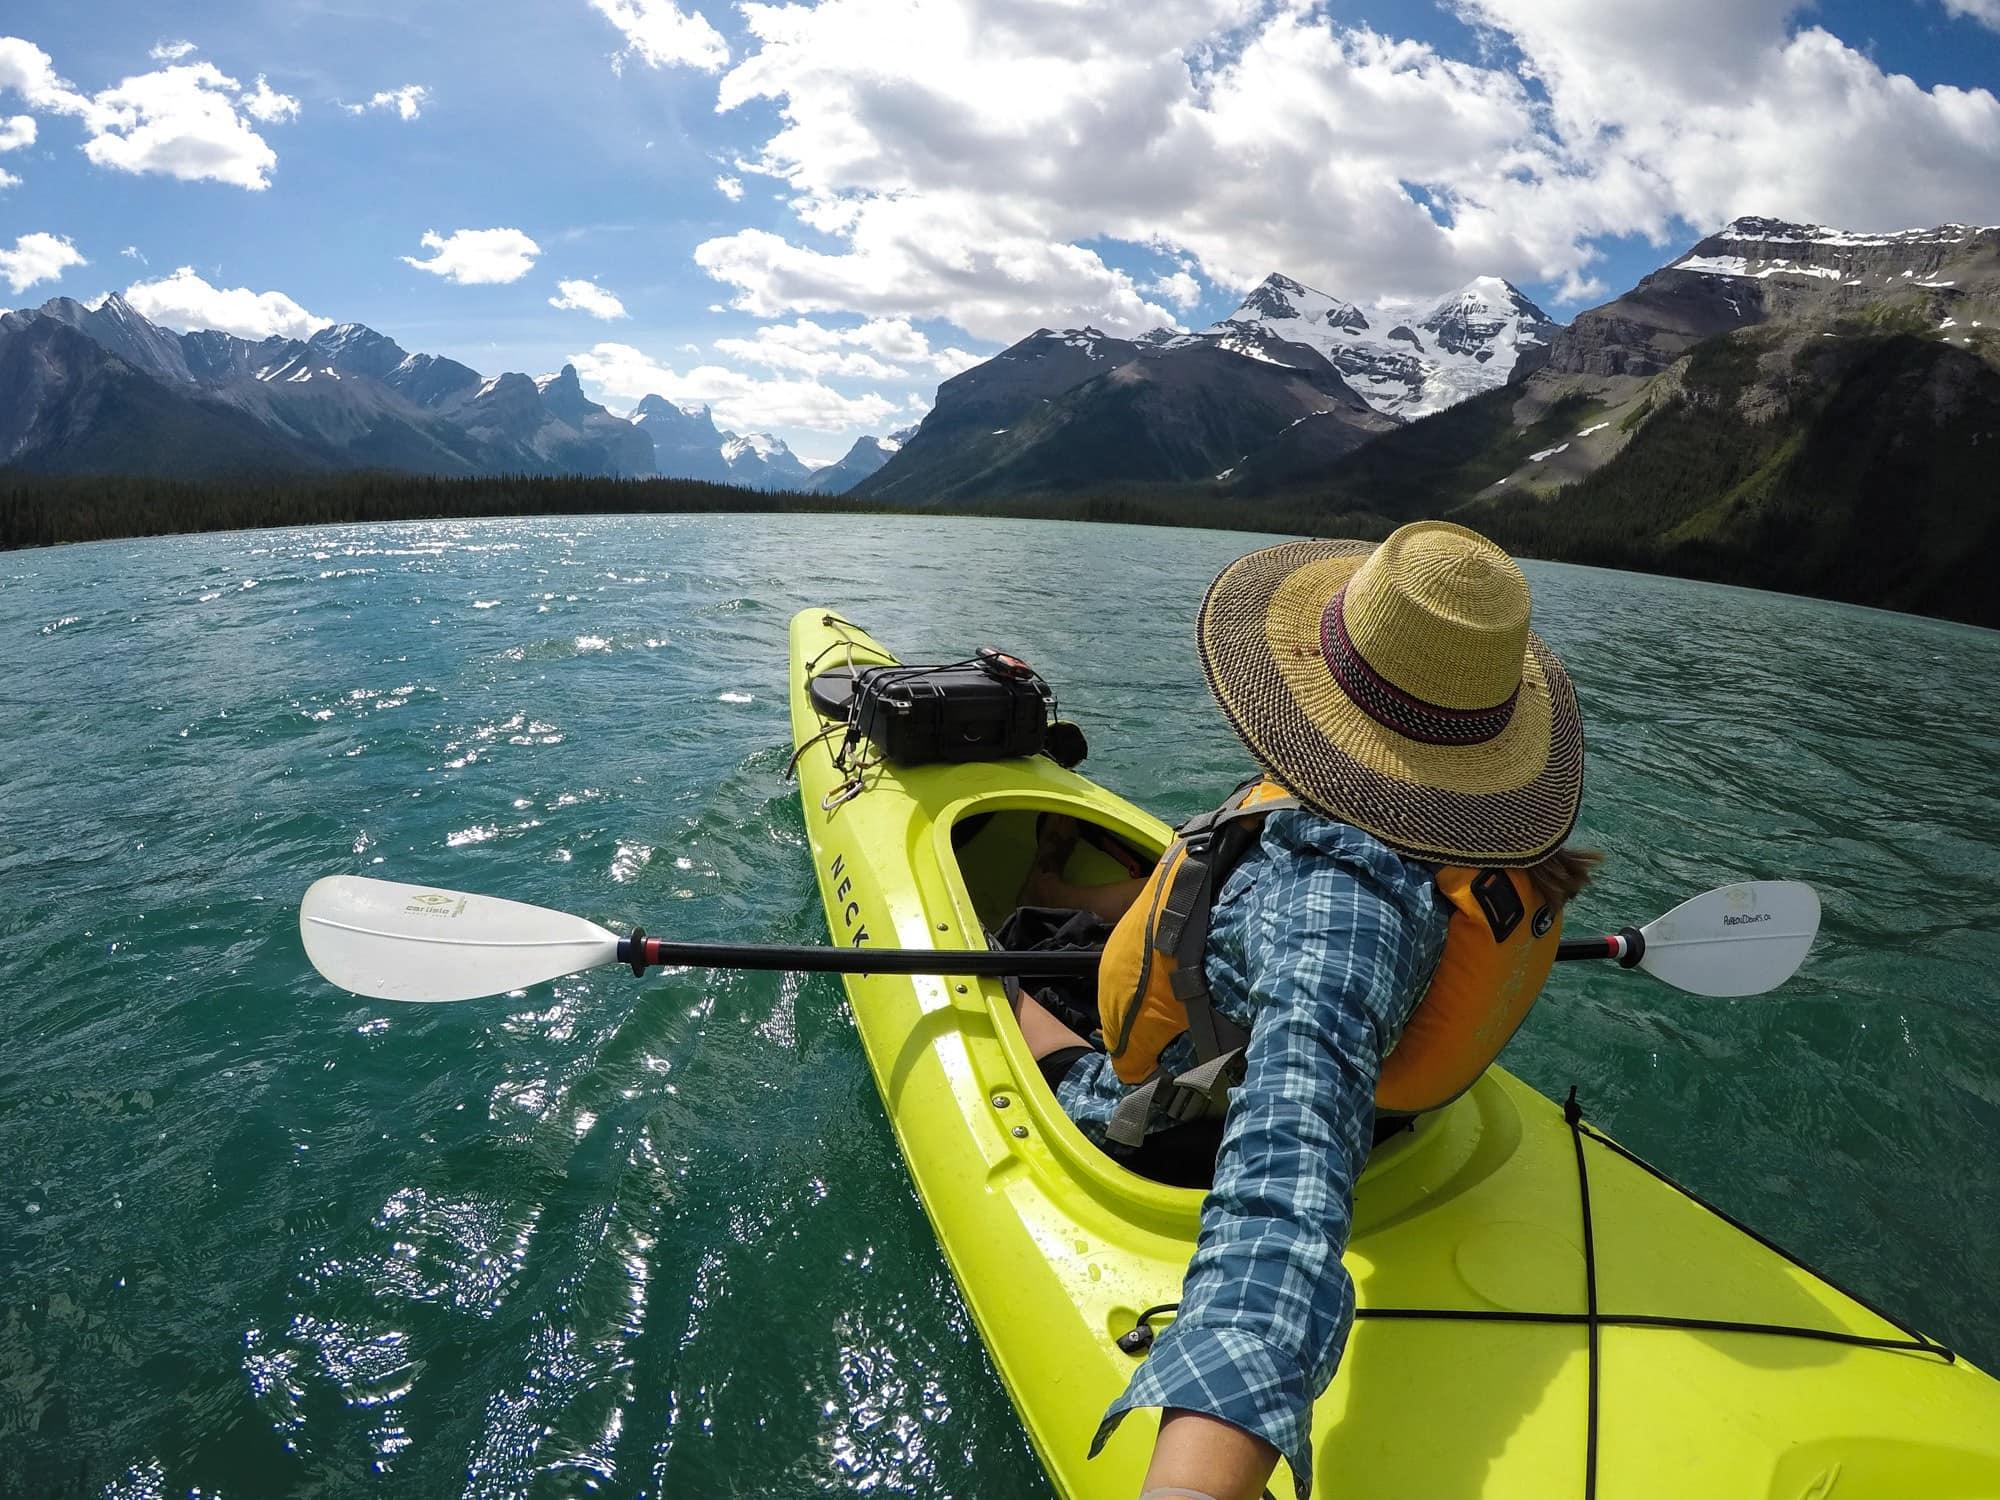 Maligne Lake Kayaking Trip in Jasper National Park